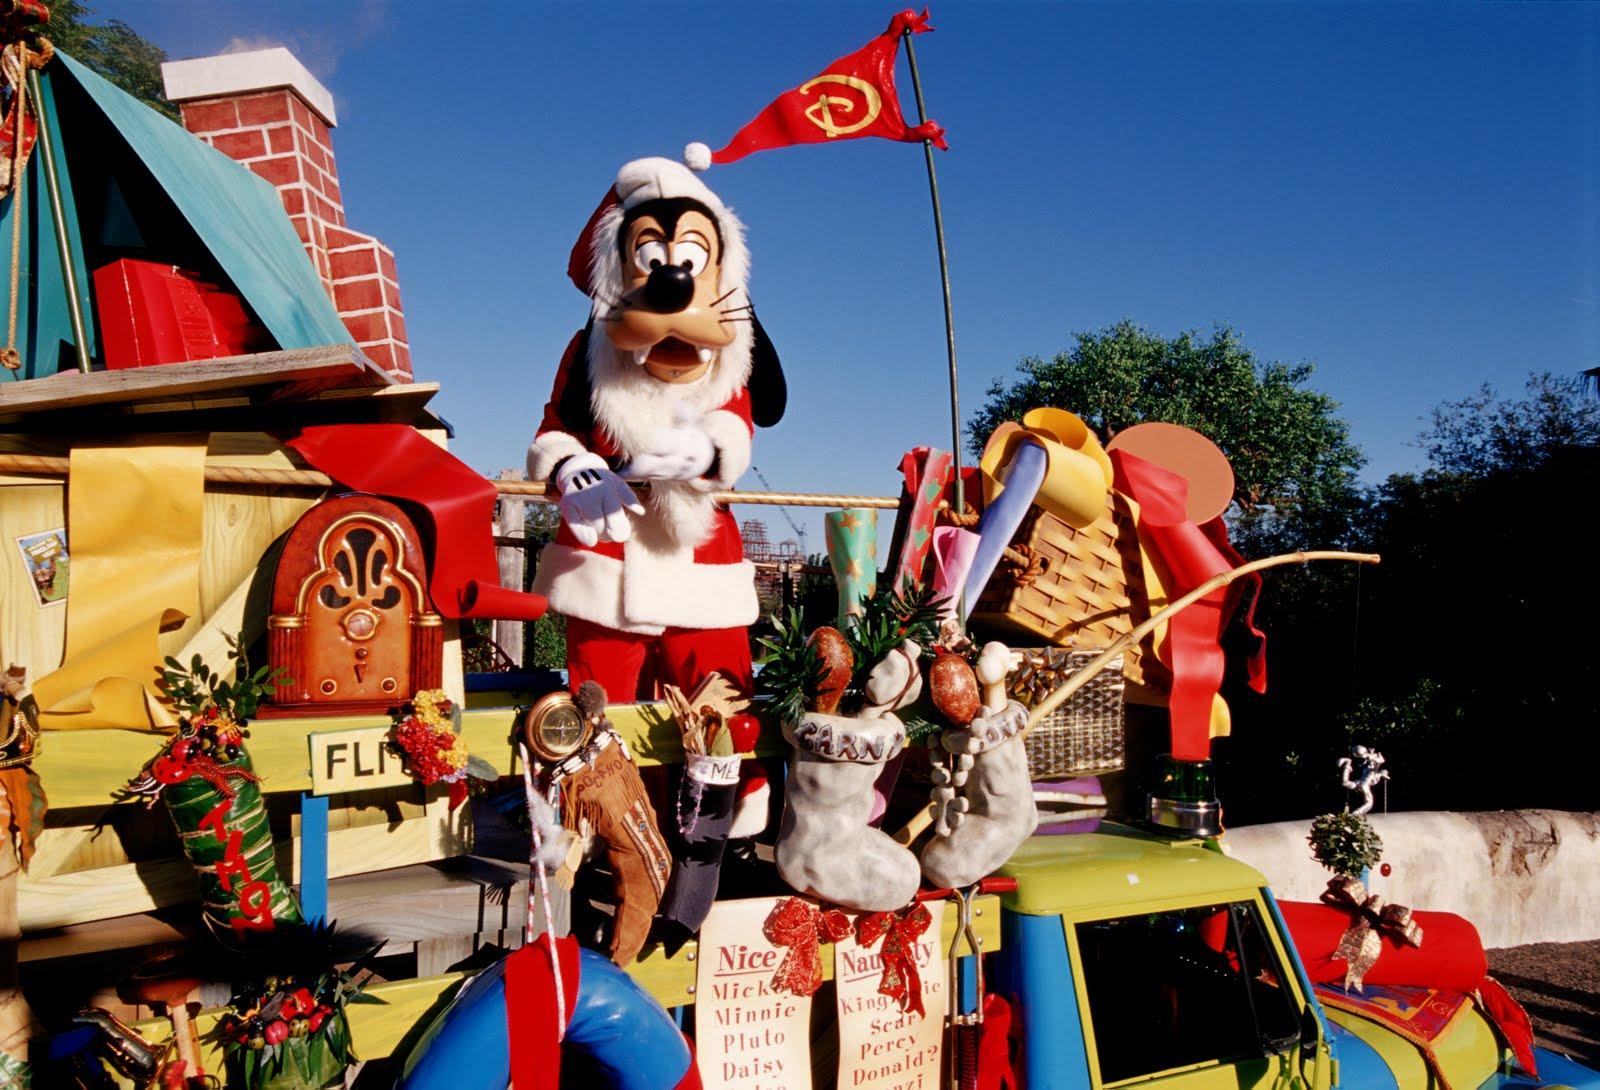 http://2.bp.blogspot.com/_O7P7LEzT_UI/THAFx_SQdJI/AAAAAAAAR5U/DX8GDJlE7pc/s1600/Mickeys+Jingle+Jungle+Parade+(c)+Disney.jpg